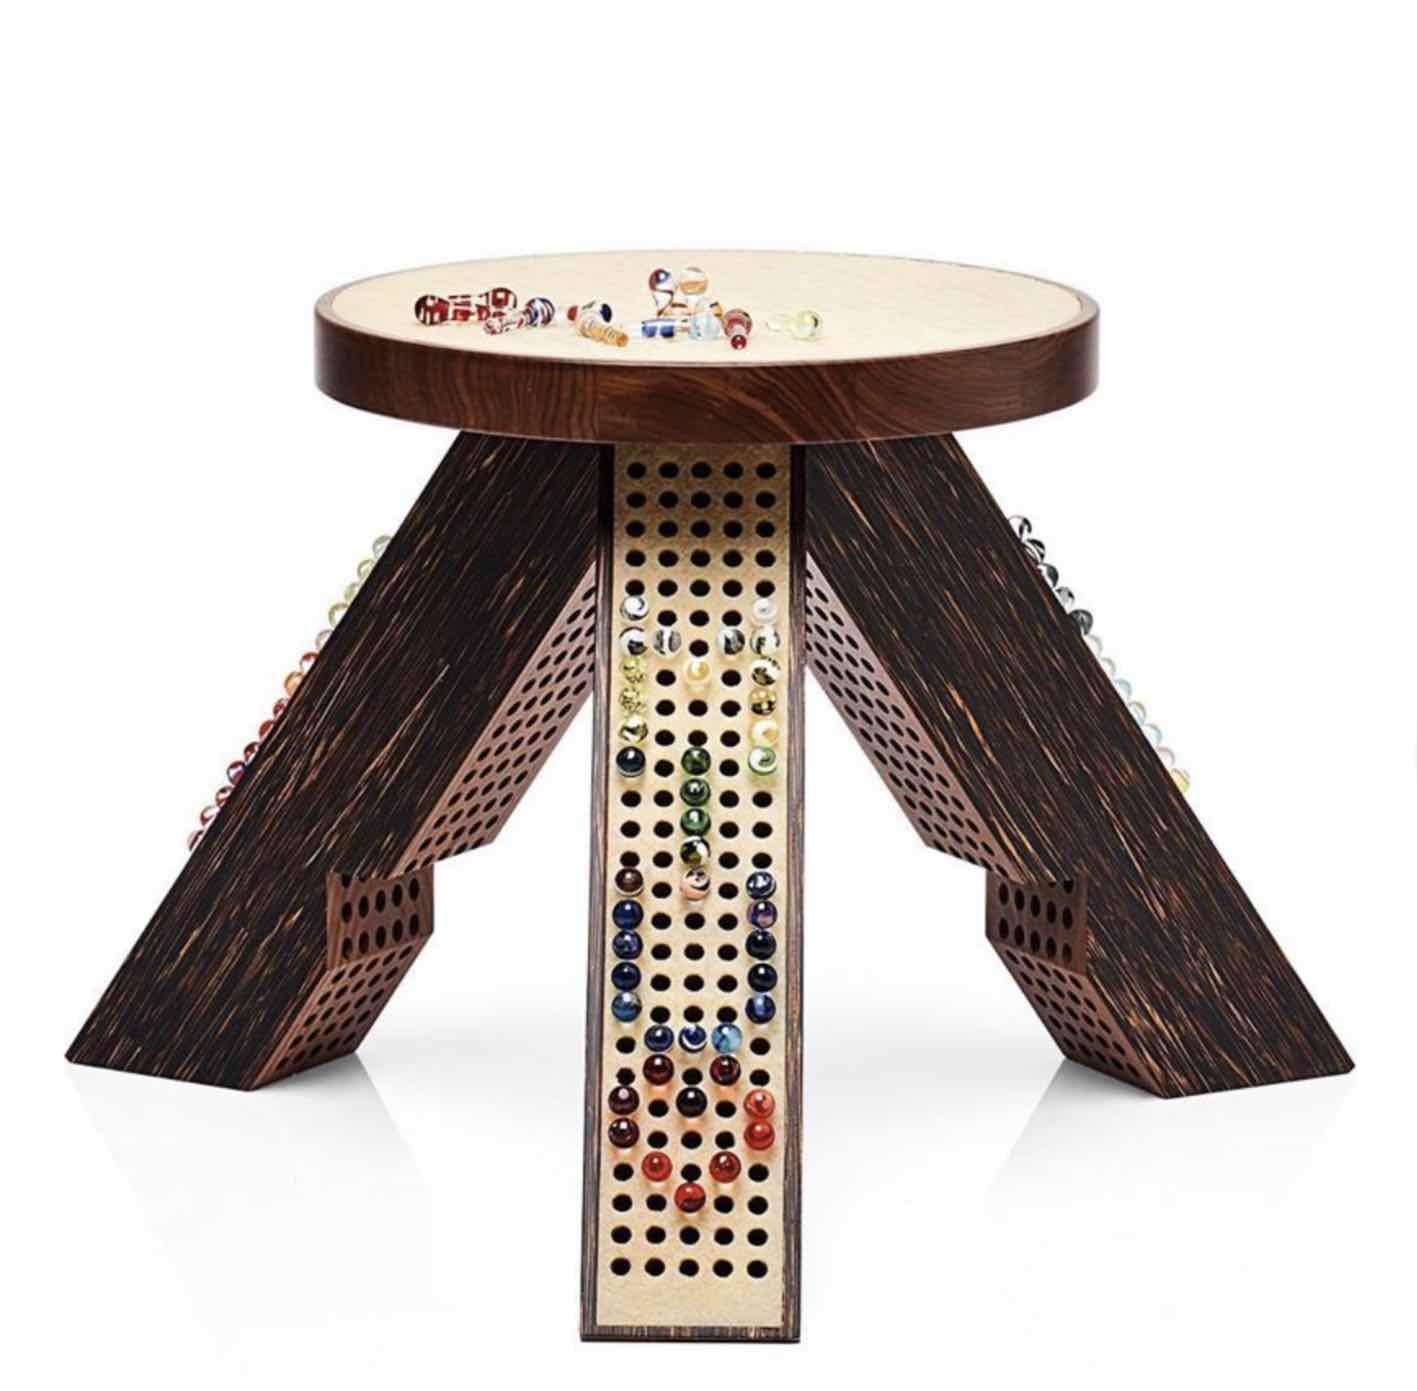 MM Marbels stool by MM Paris for Miu Miu - Photo via IG by @miumiu.